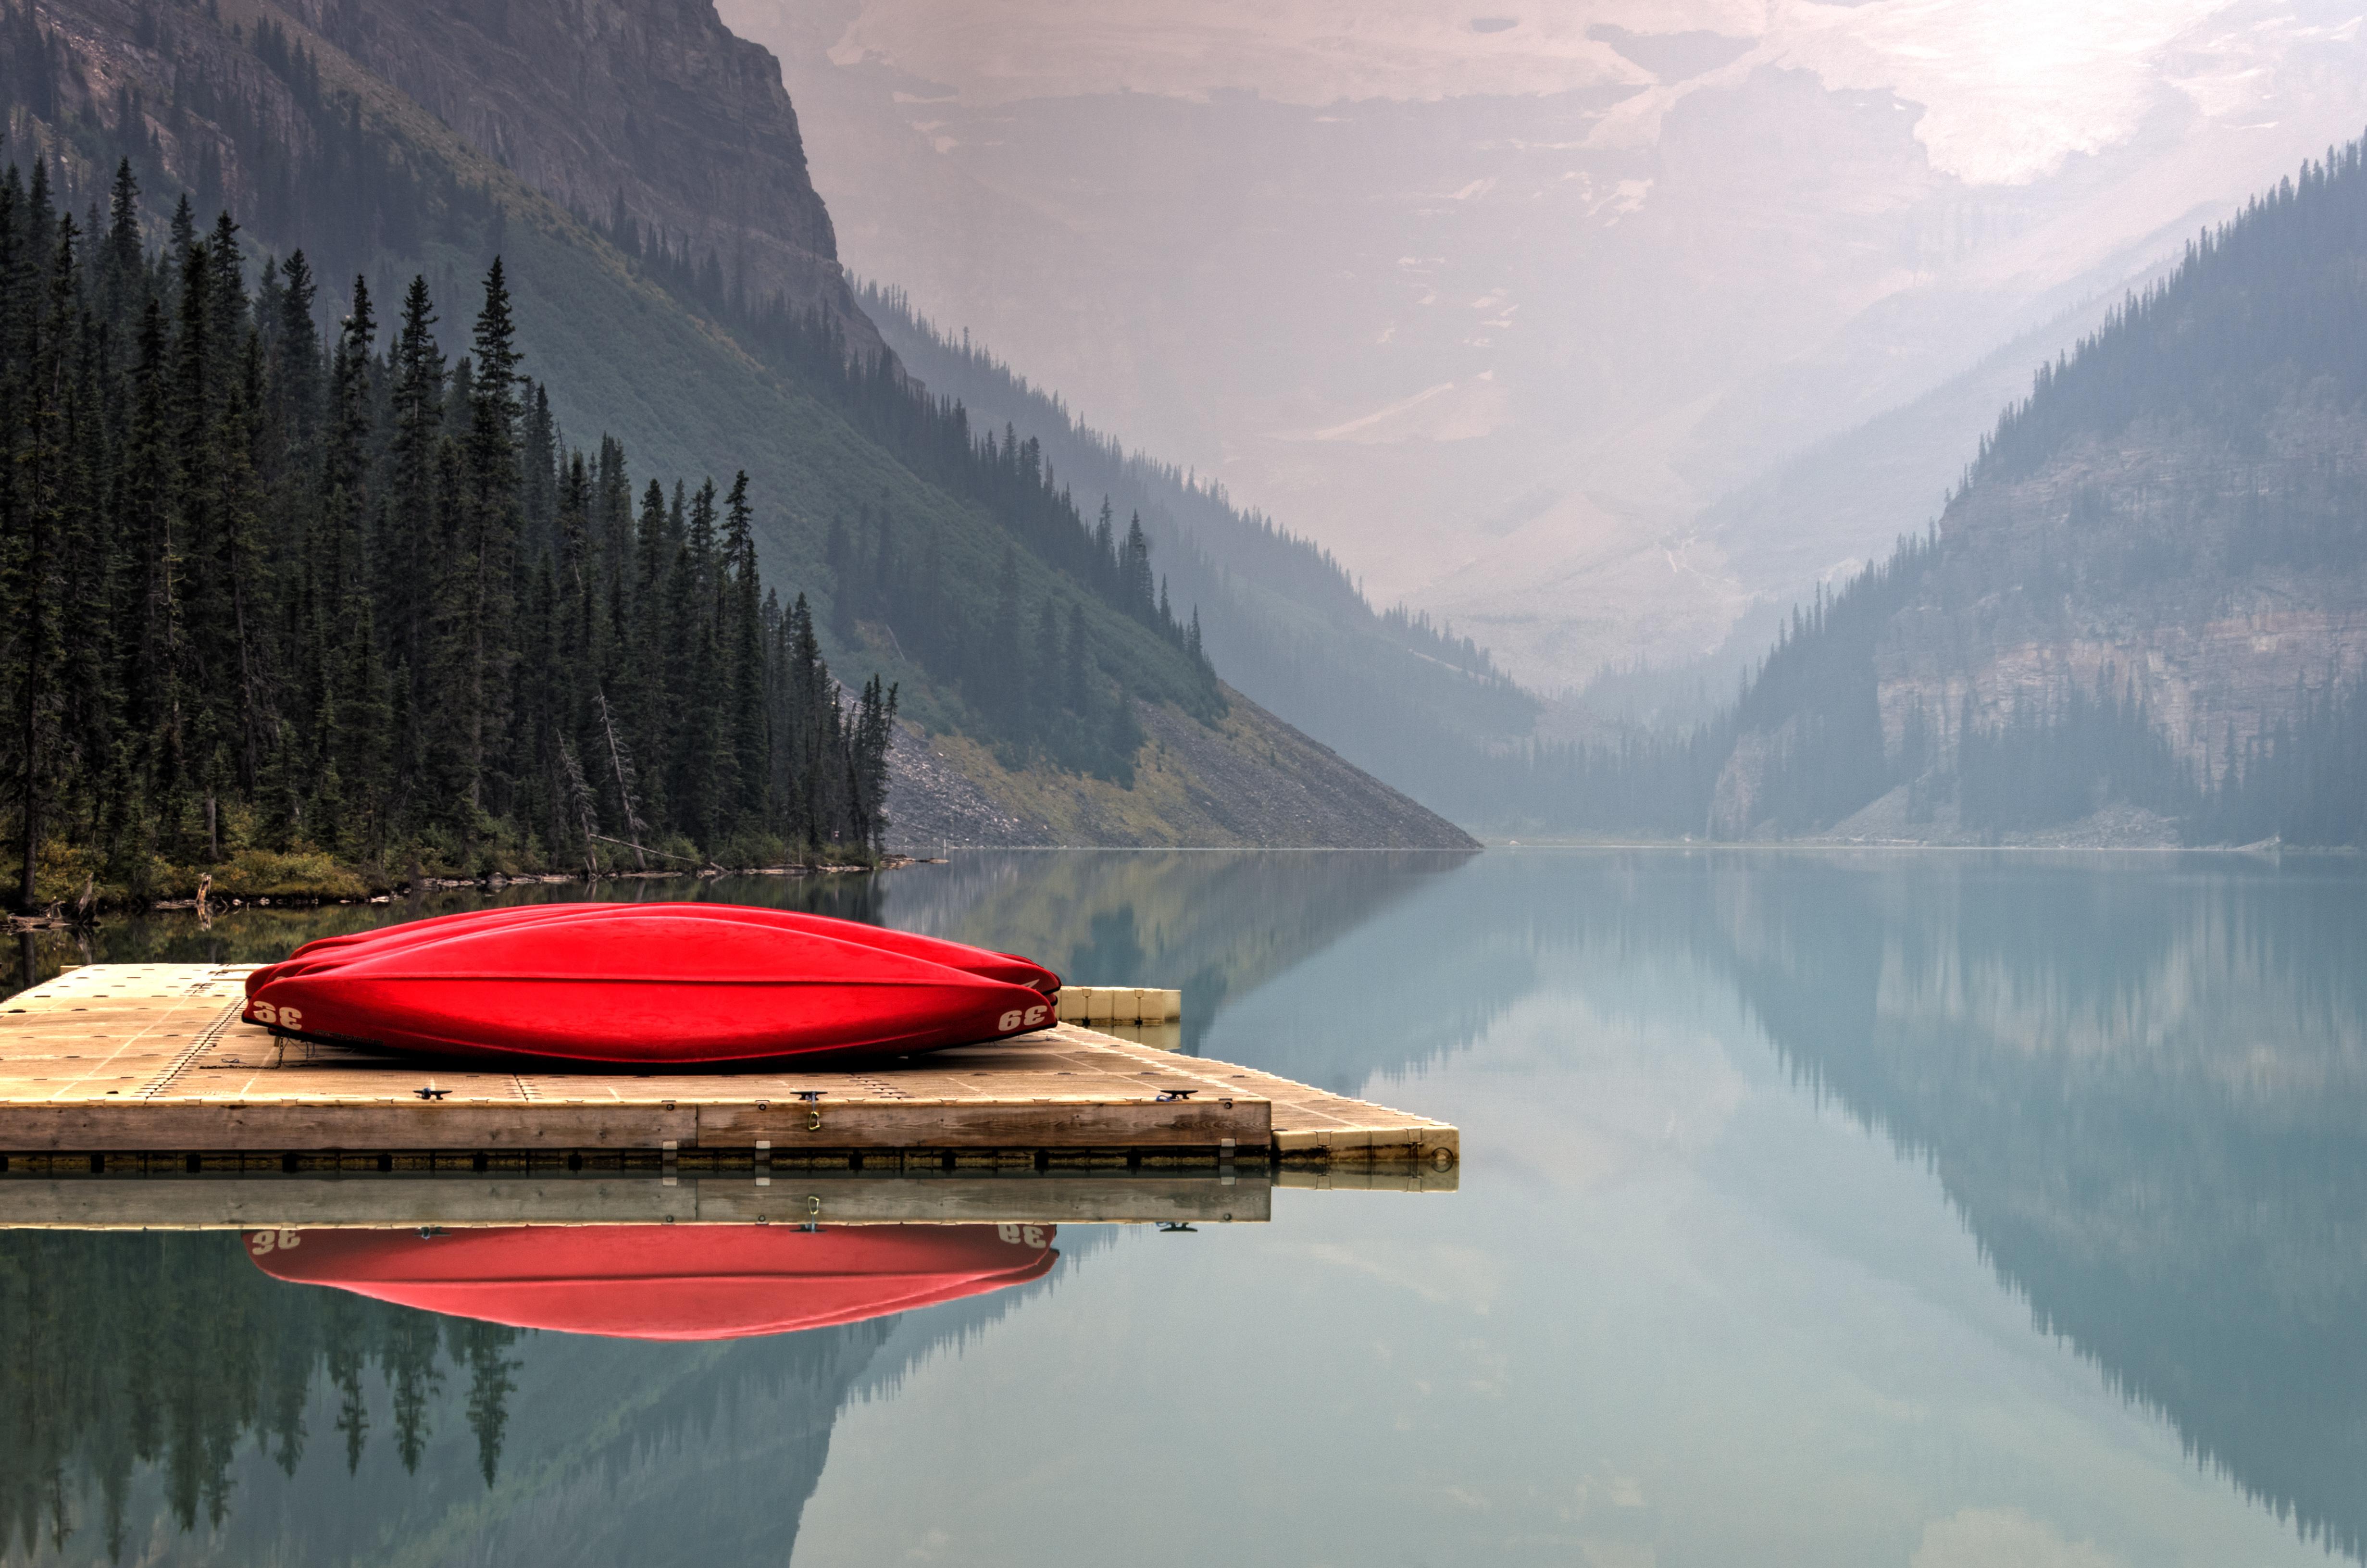 Jasper-Canoe-Adventure